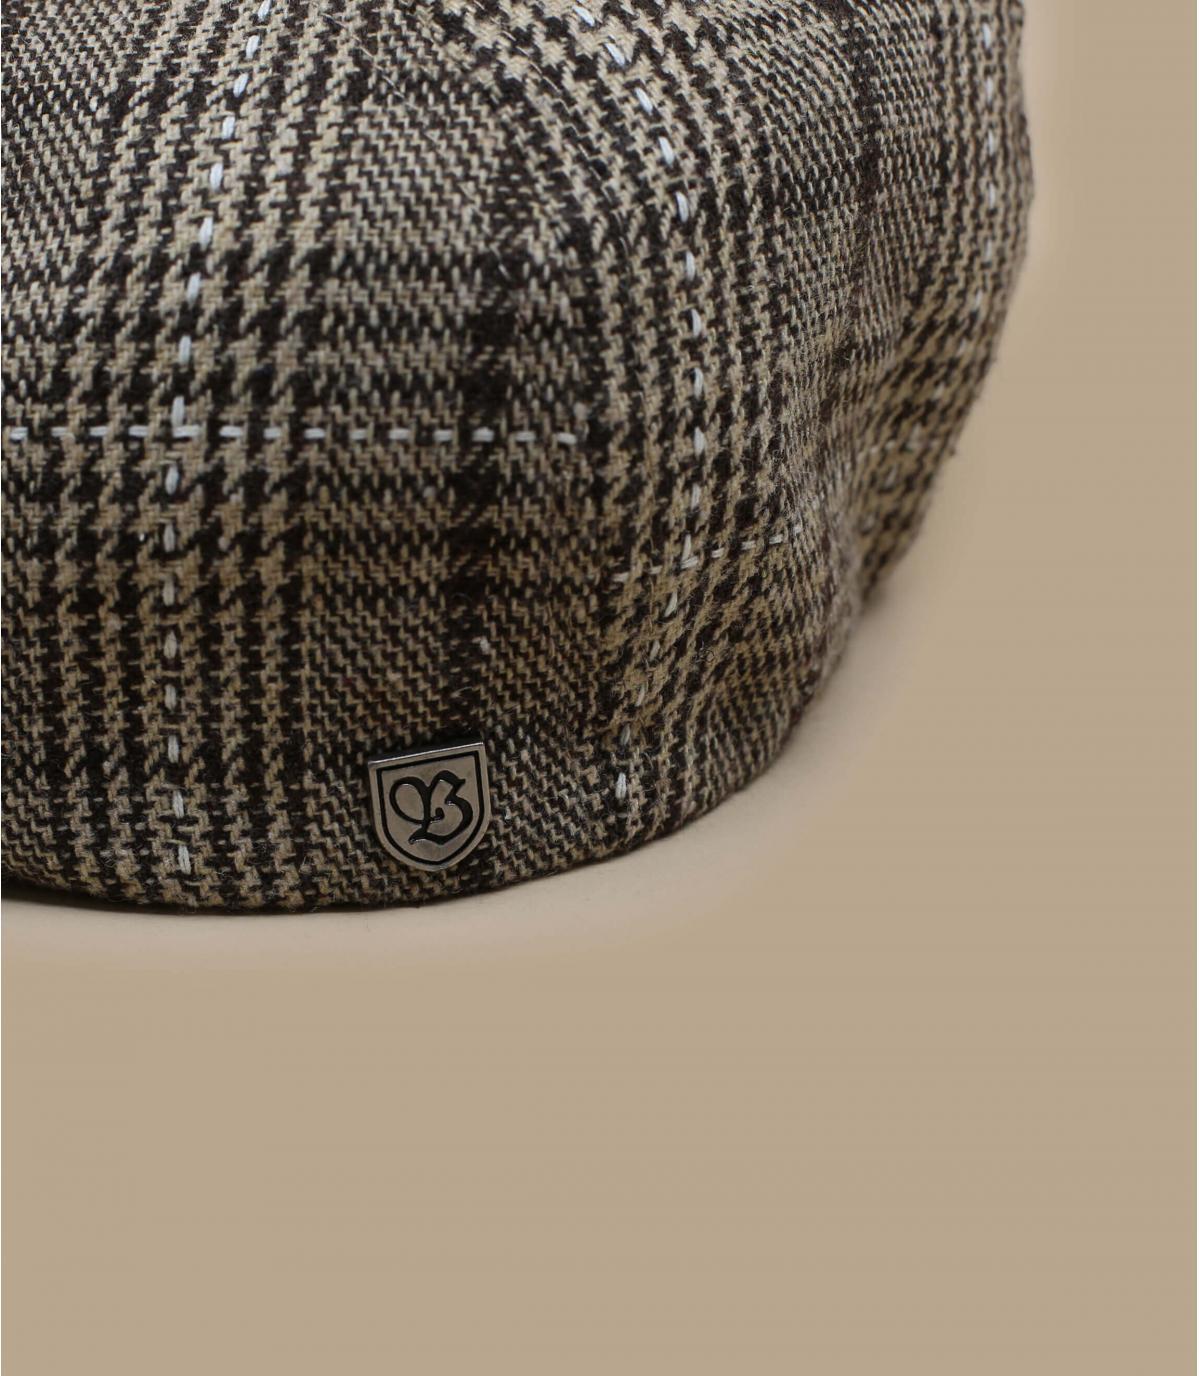 gorra repartidor marrón cuadros